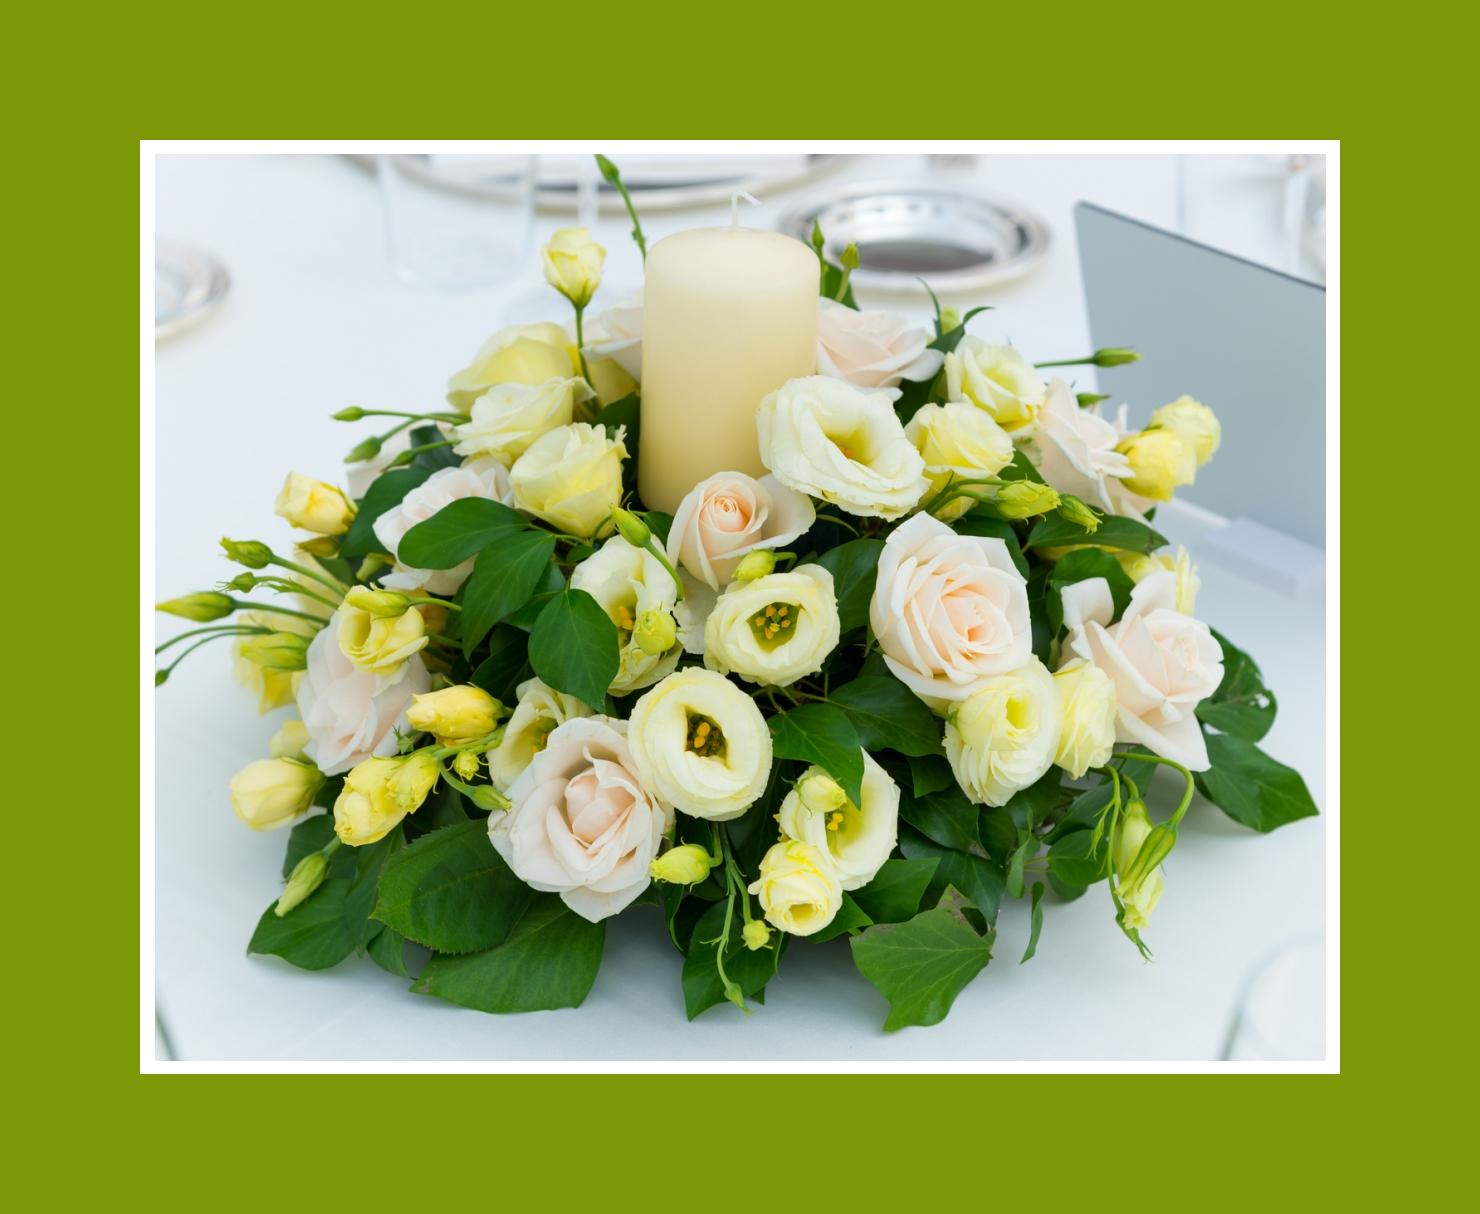 Blumengesteck aus Rosen & Ranunkeln